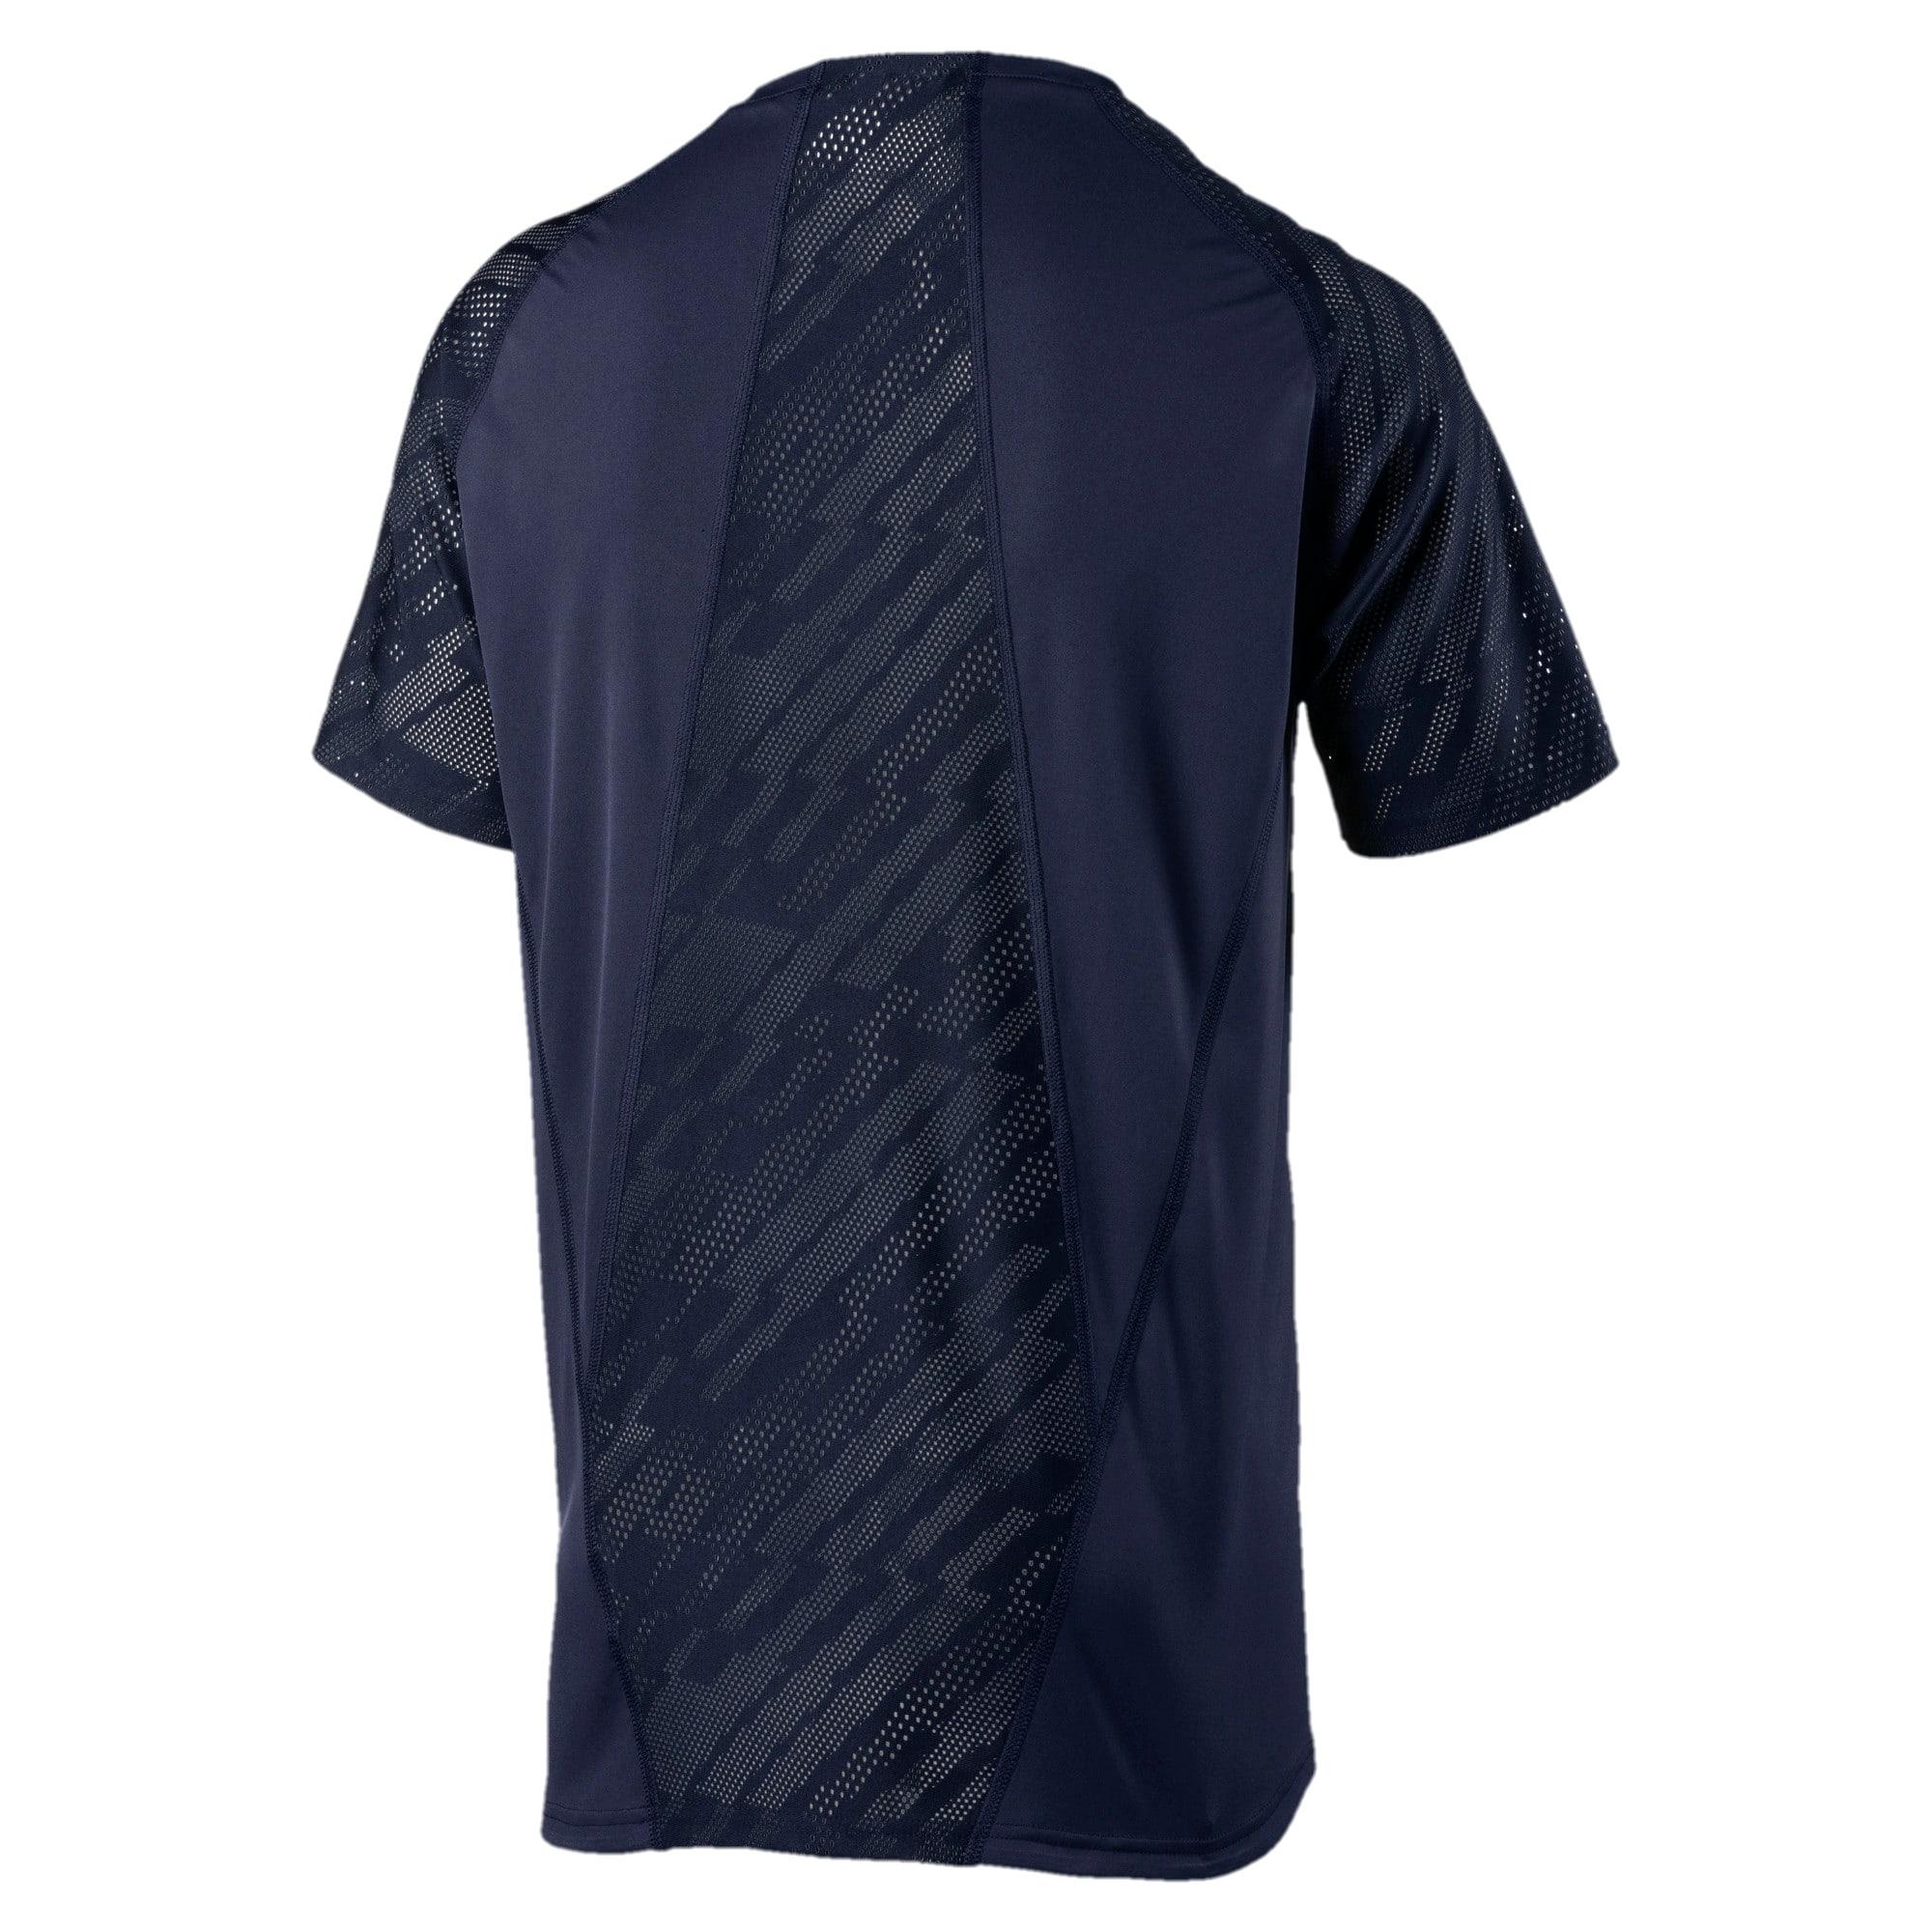 Thumbnail 4 of VENT Graphic Men's T-Shirt, Peacoat-iron gate, medium